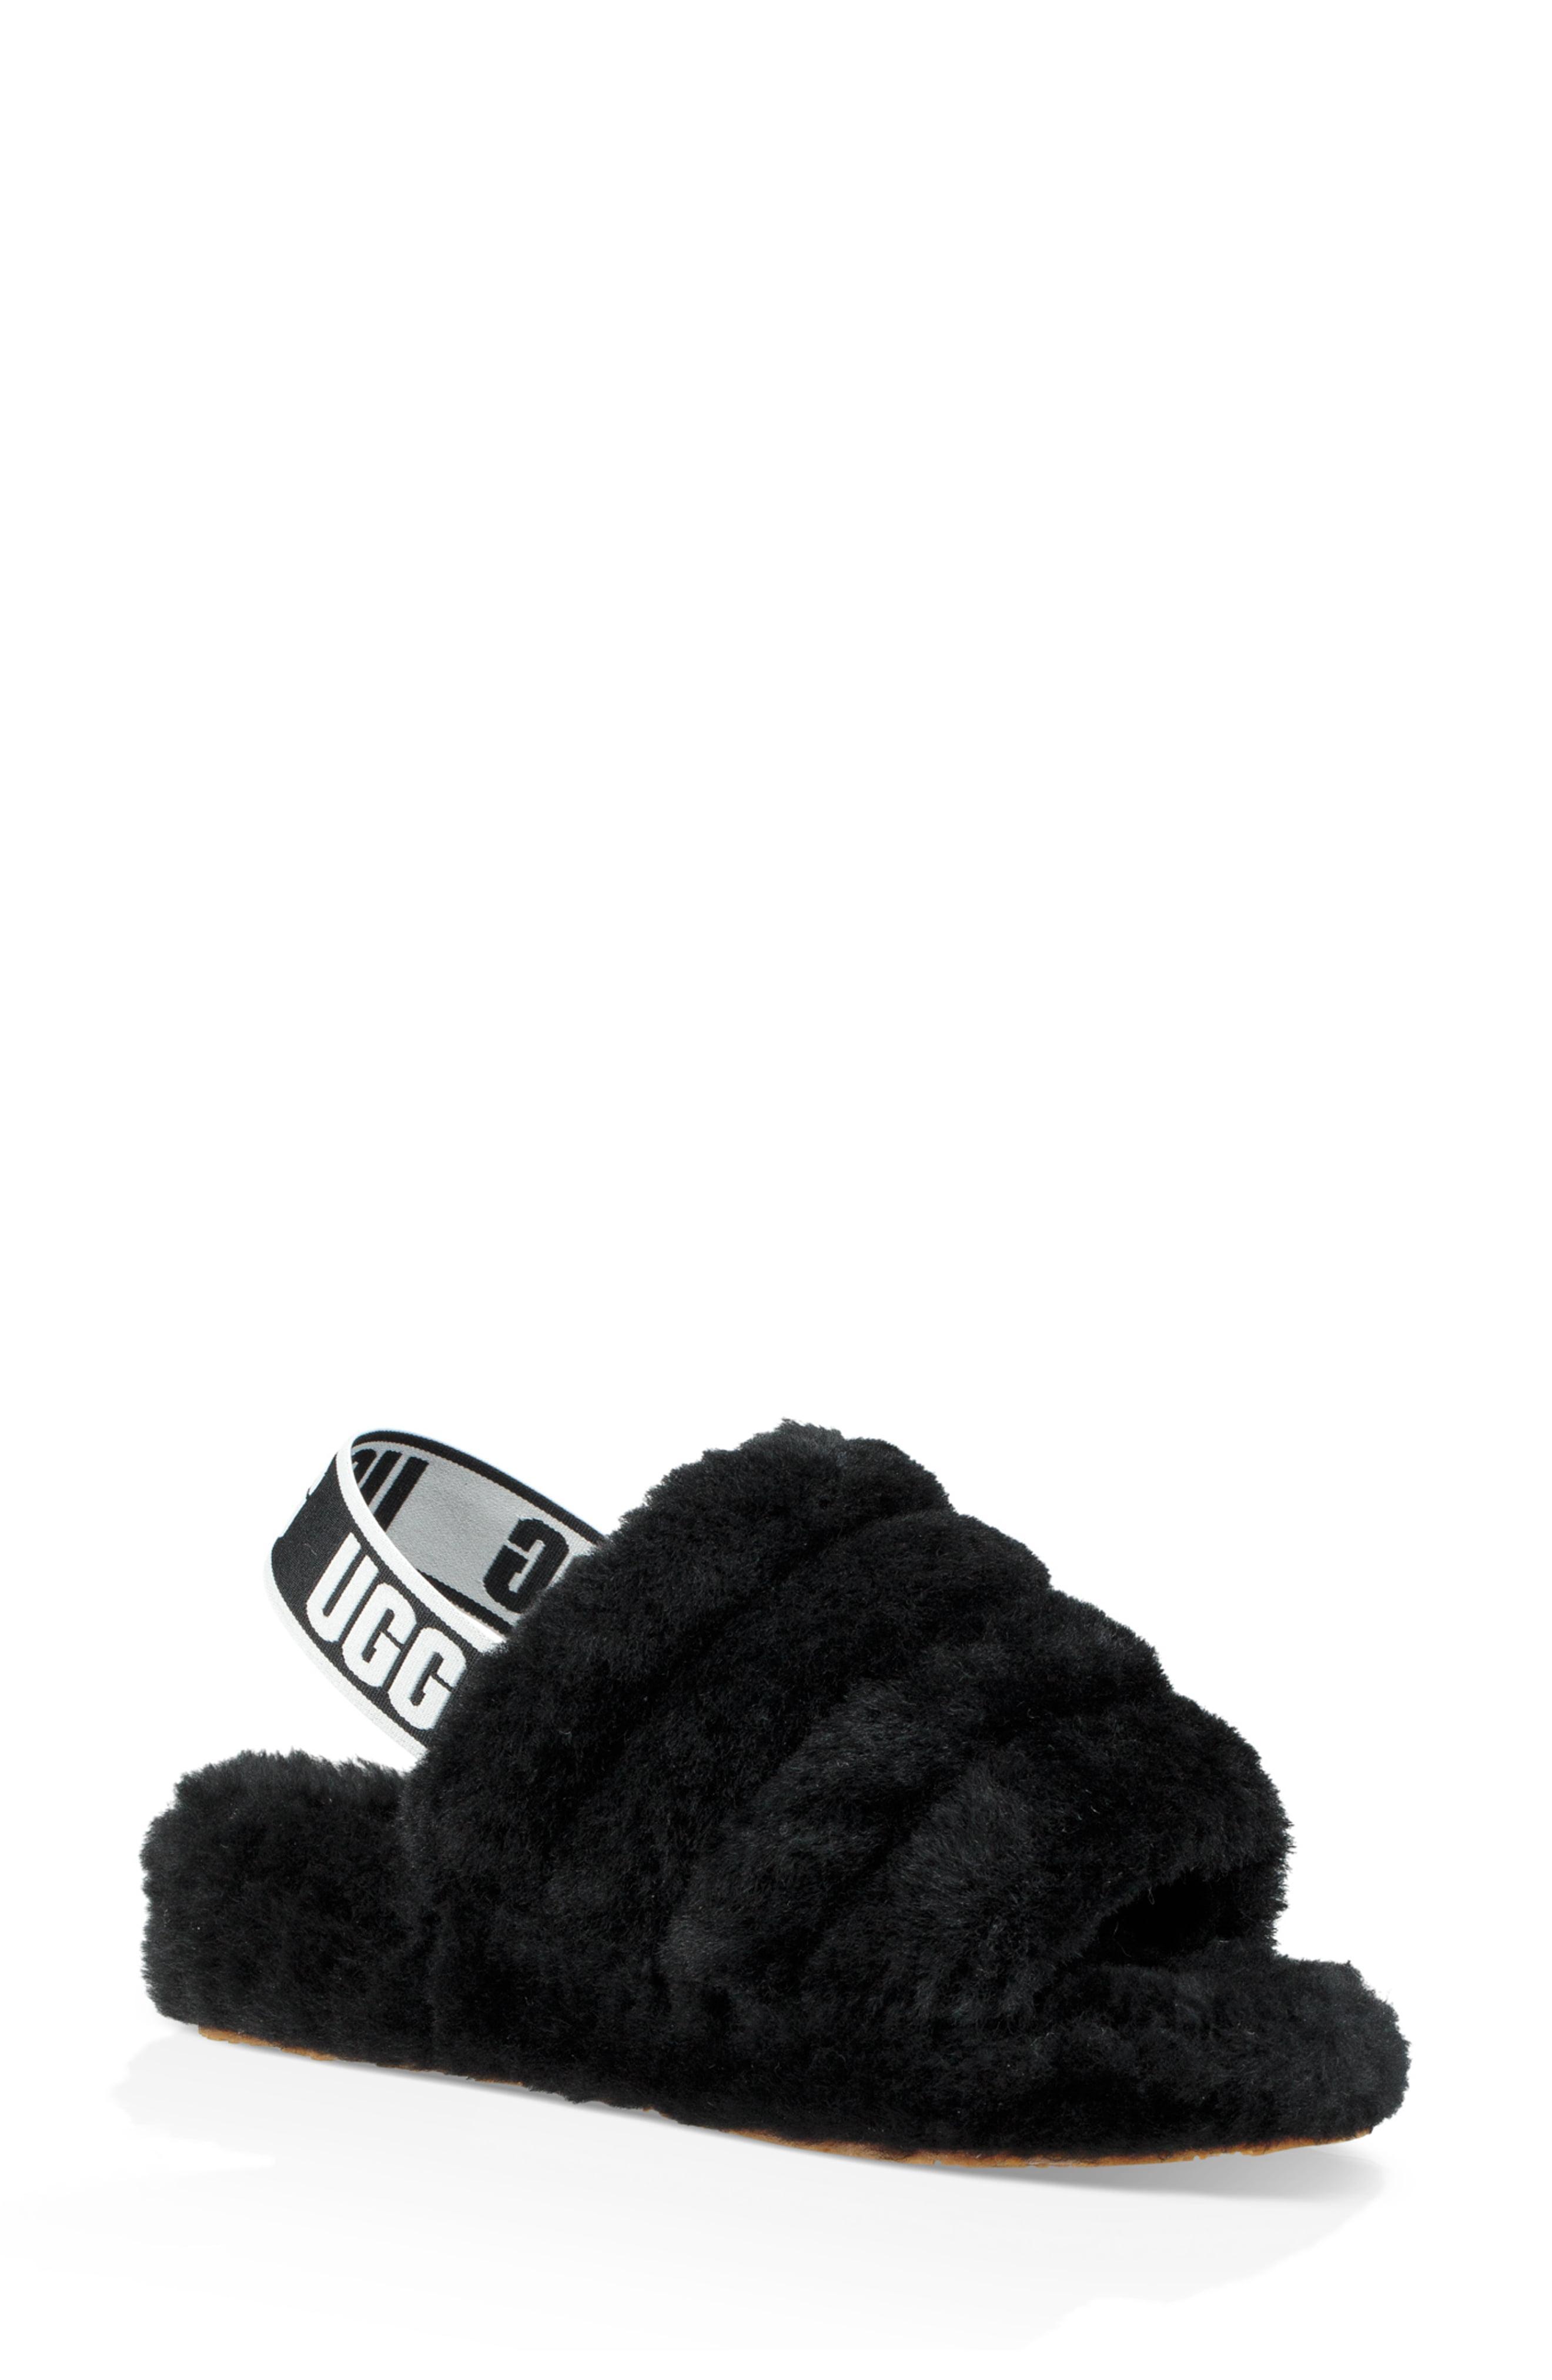 32f92a04d75 Ugg - Black Ugg Fluff Yeah Genuine Shearling Slipper - Lyst. View fullscreen